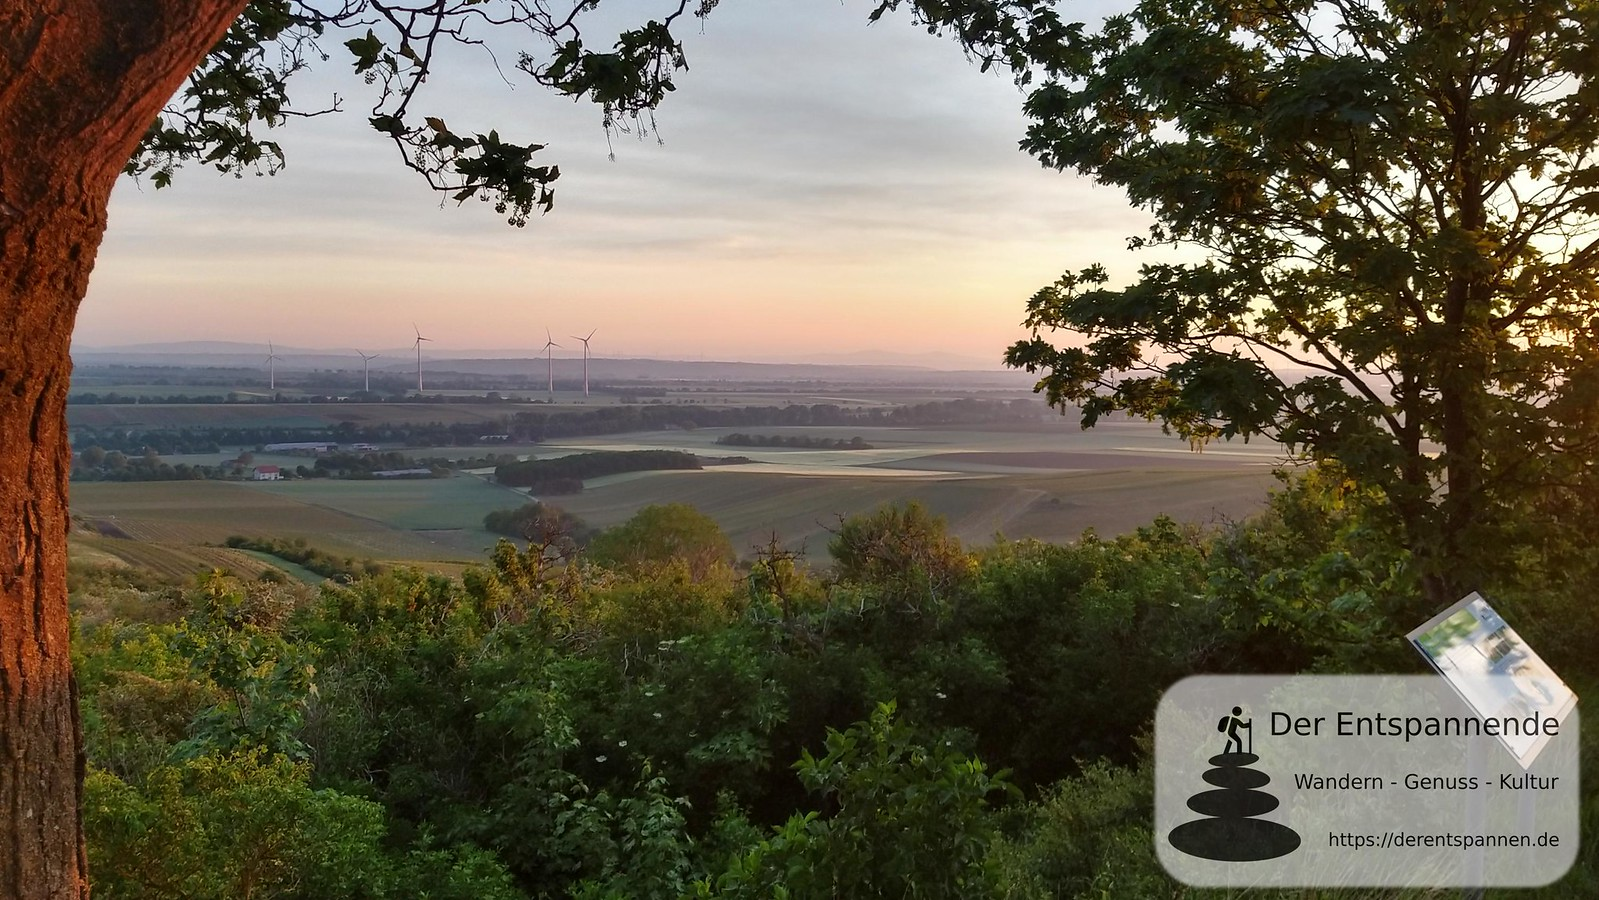 Blick über Selztal bis Taunus vom Petersberg (Rheinhessen)